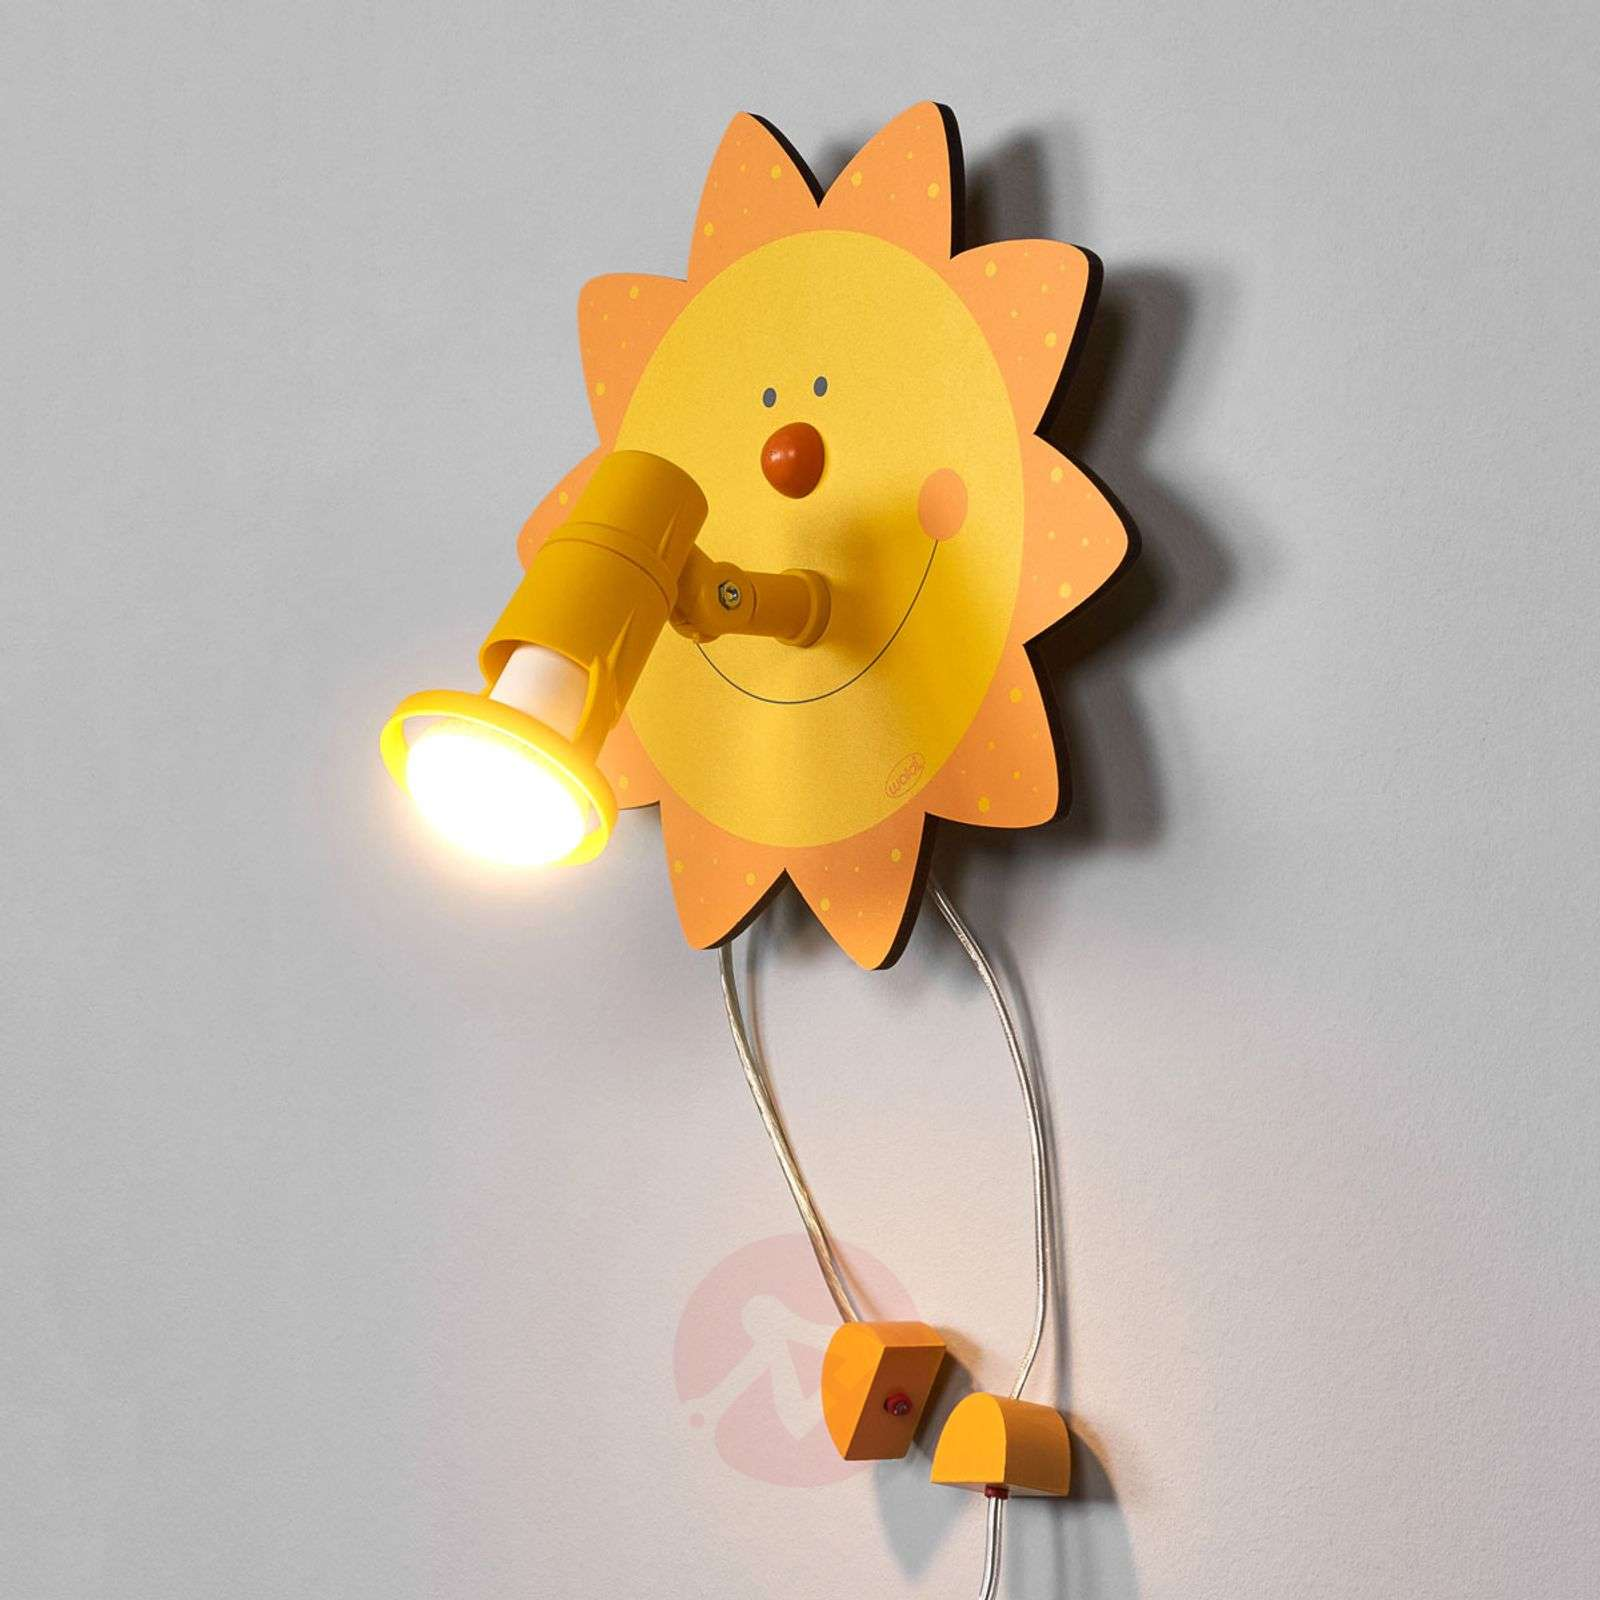 Funny Sun wall light-9606004-01